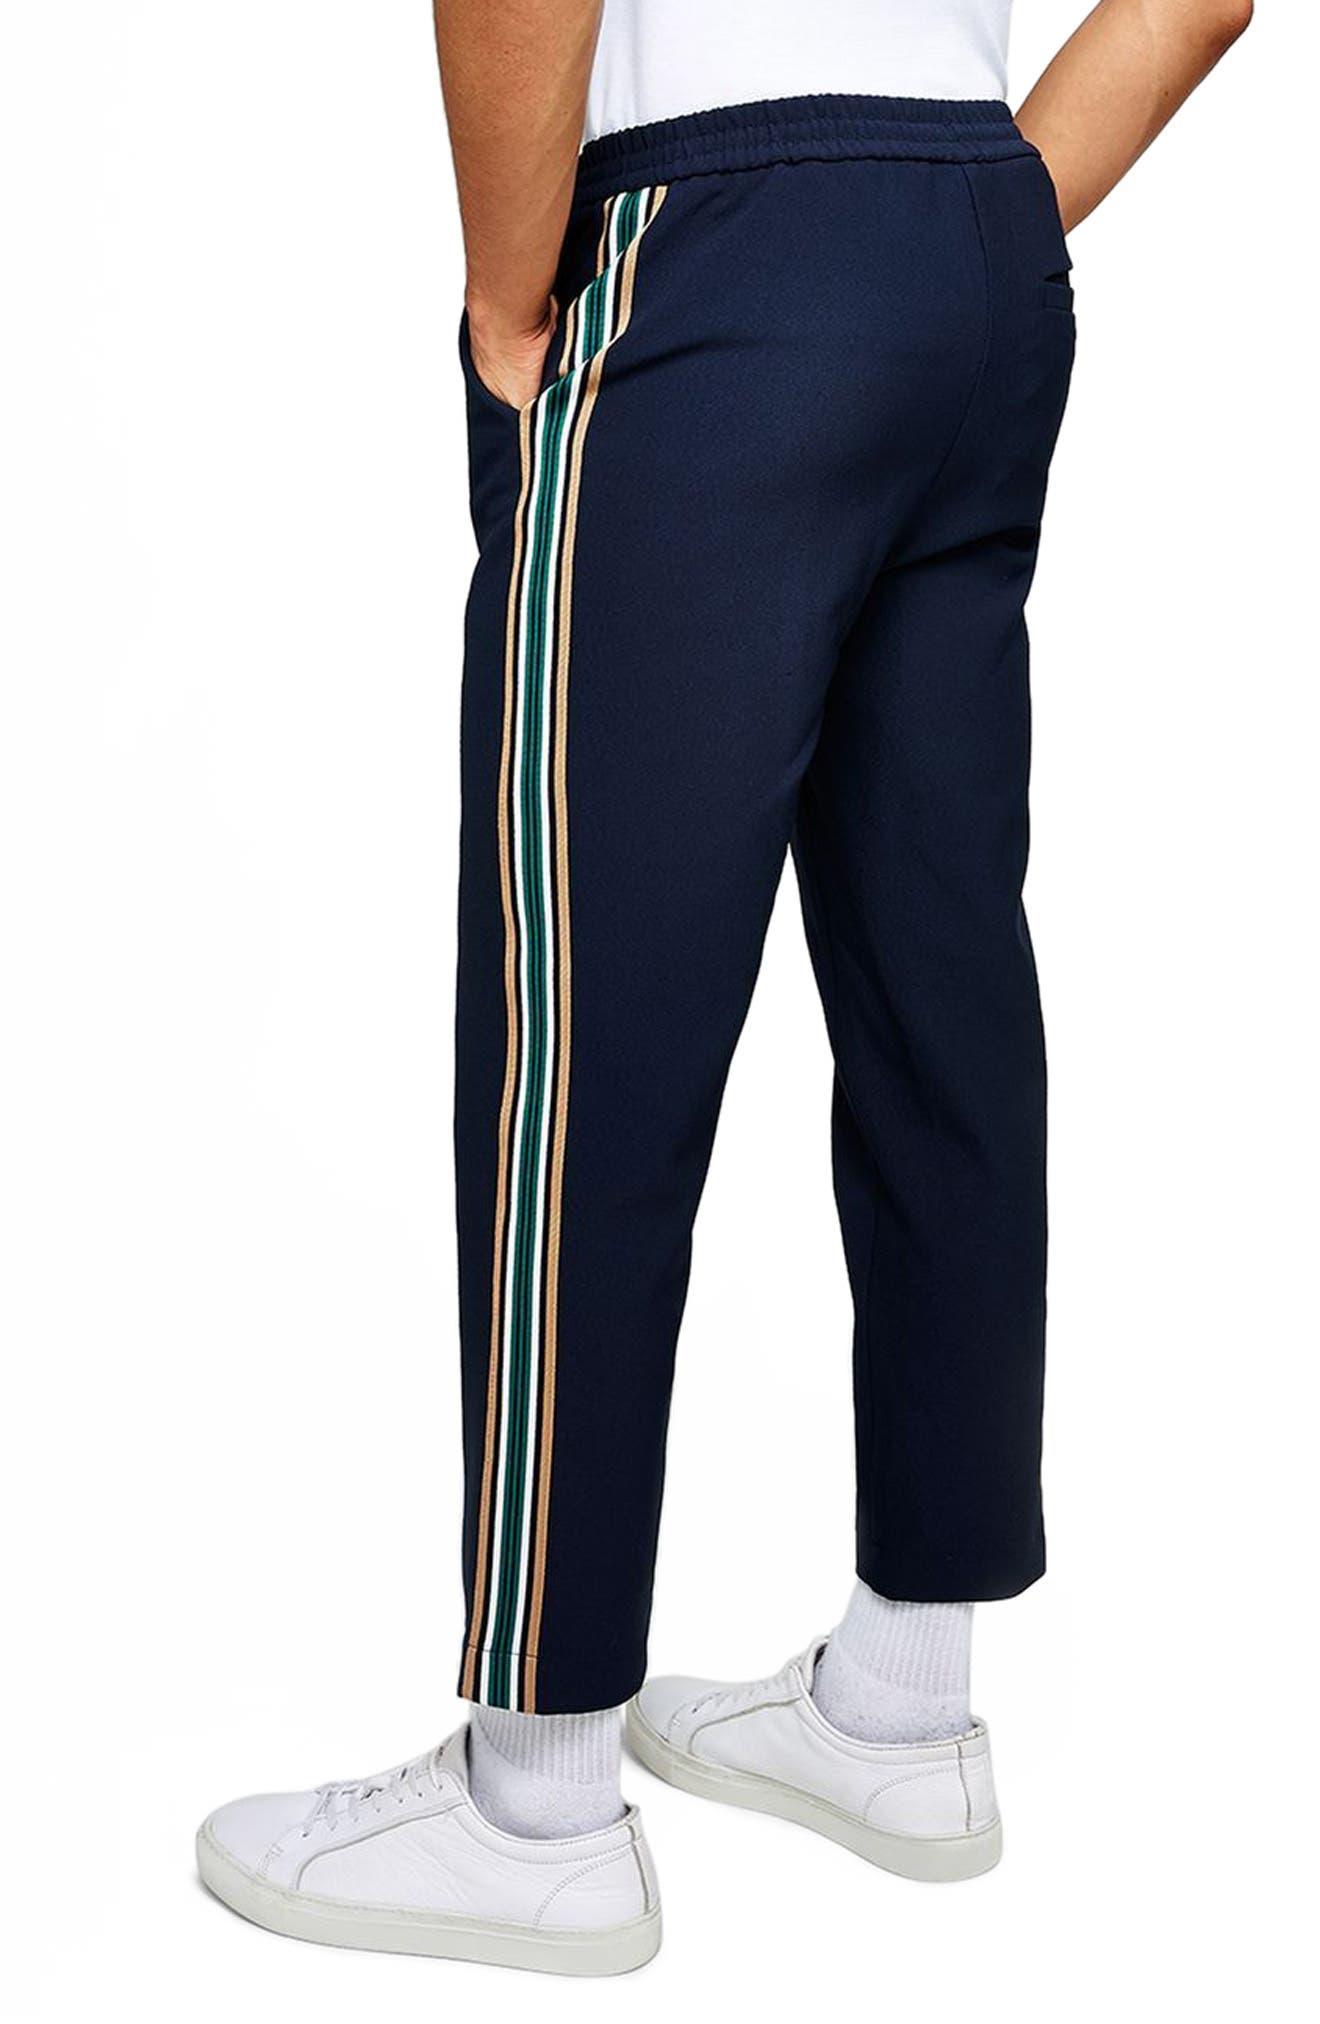 Cropped Slim Fit Jogger Pants,                         Main,                         color, 401